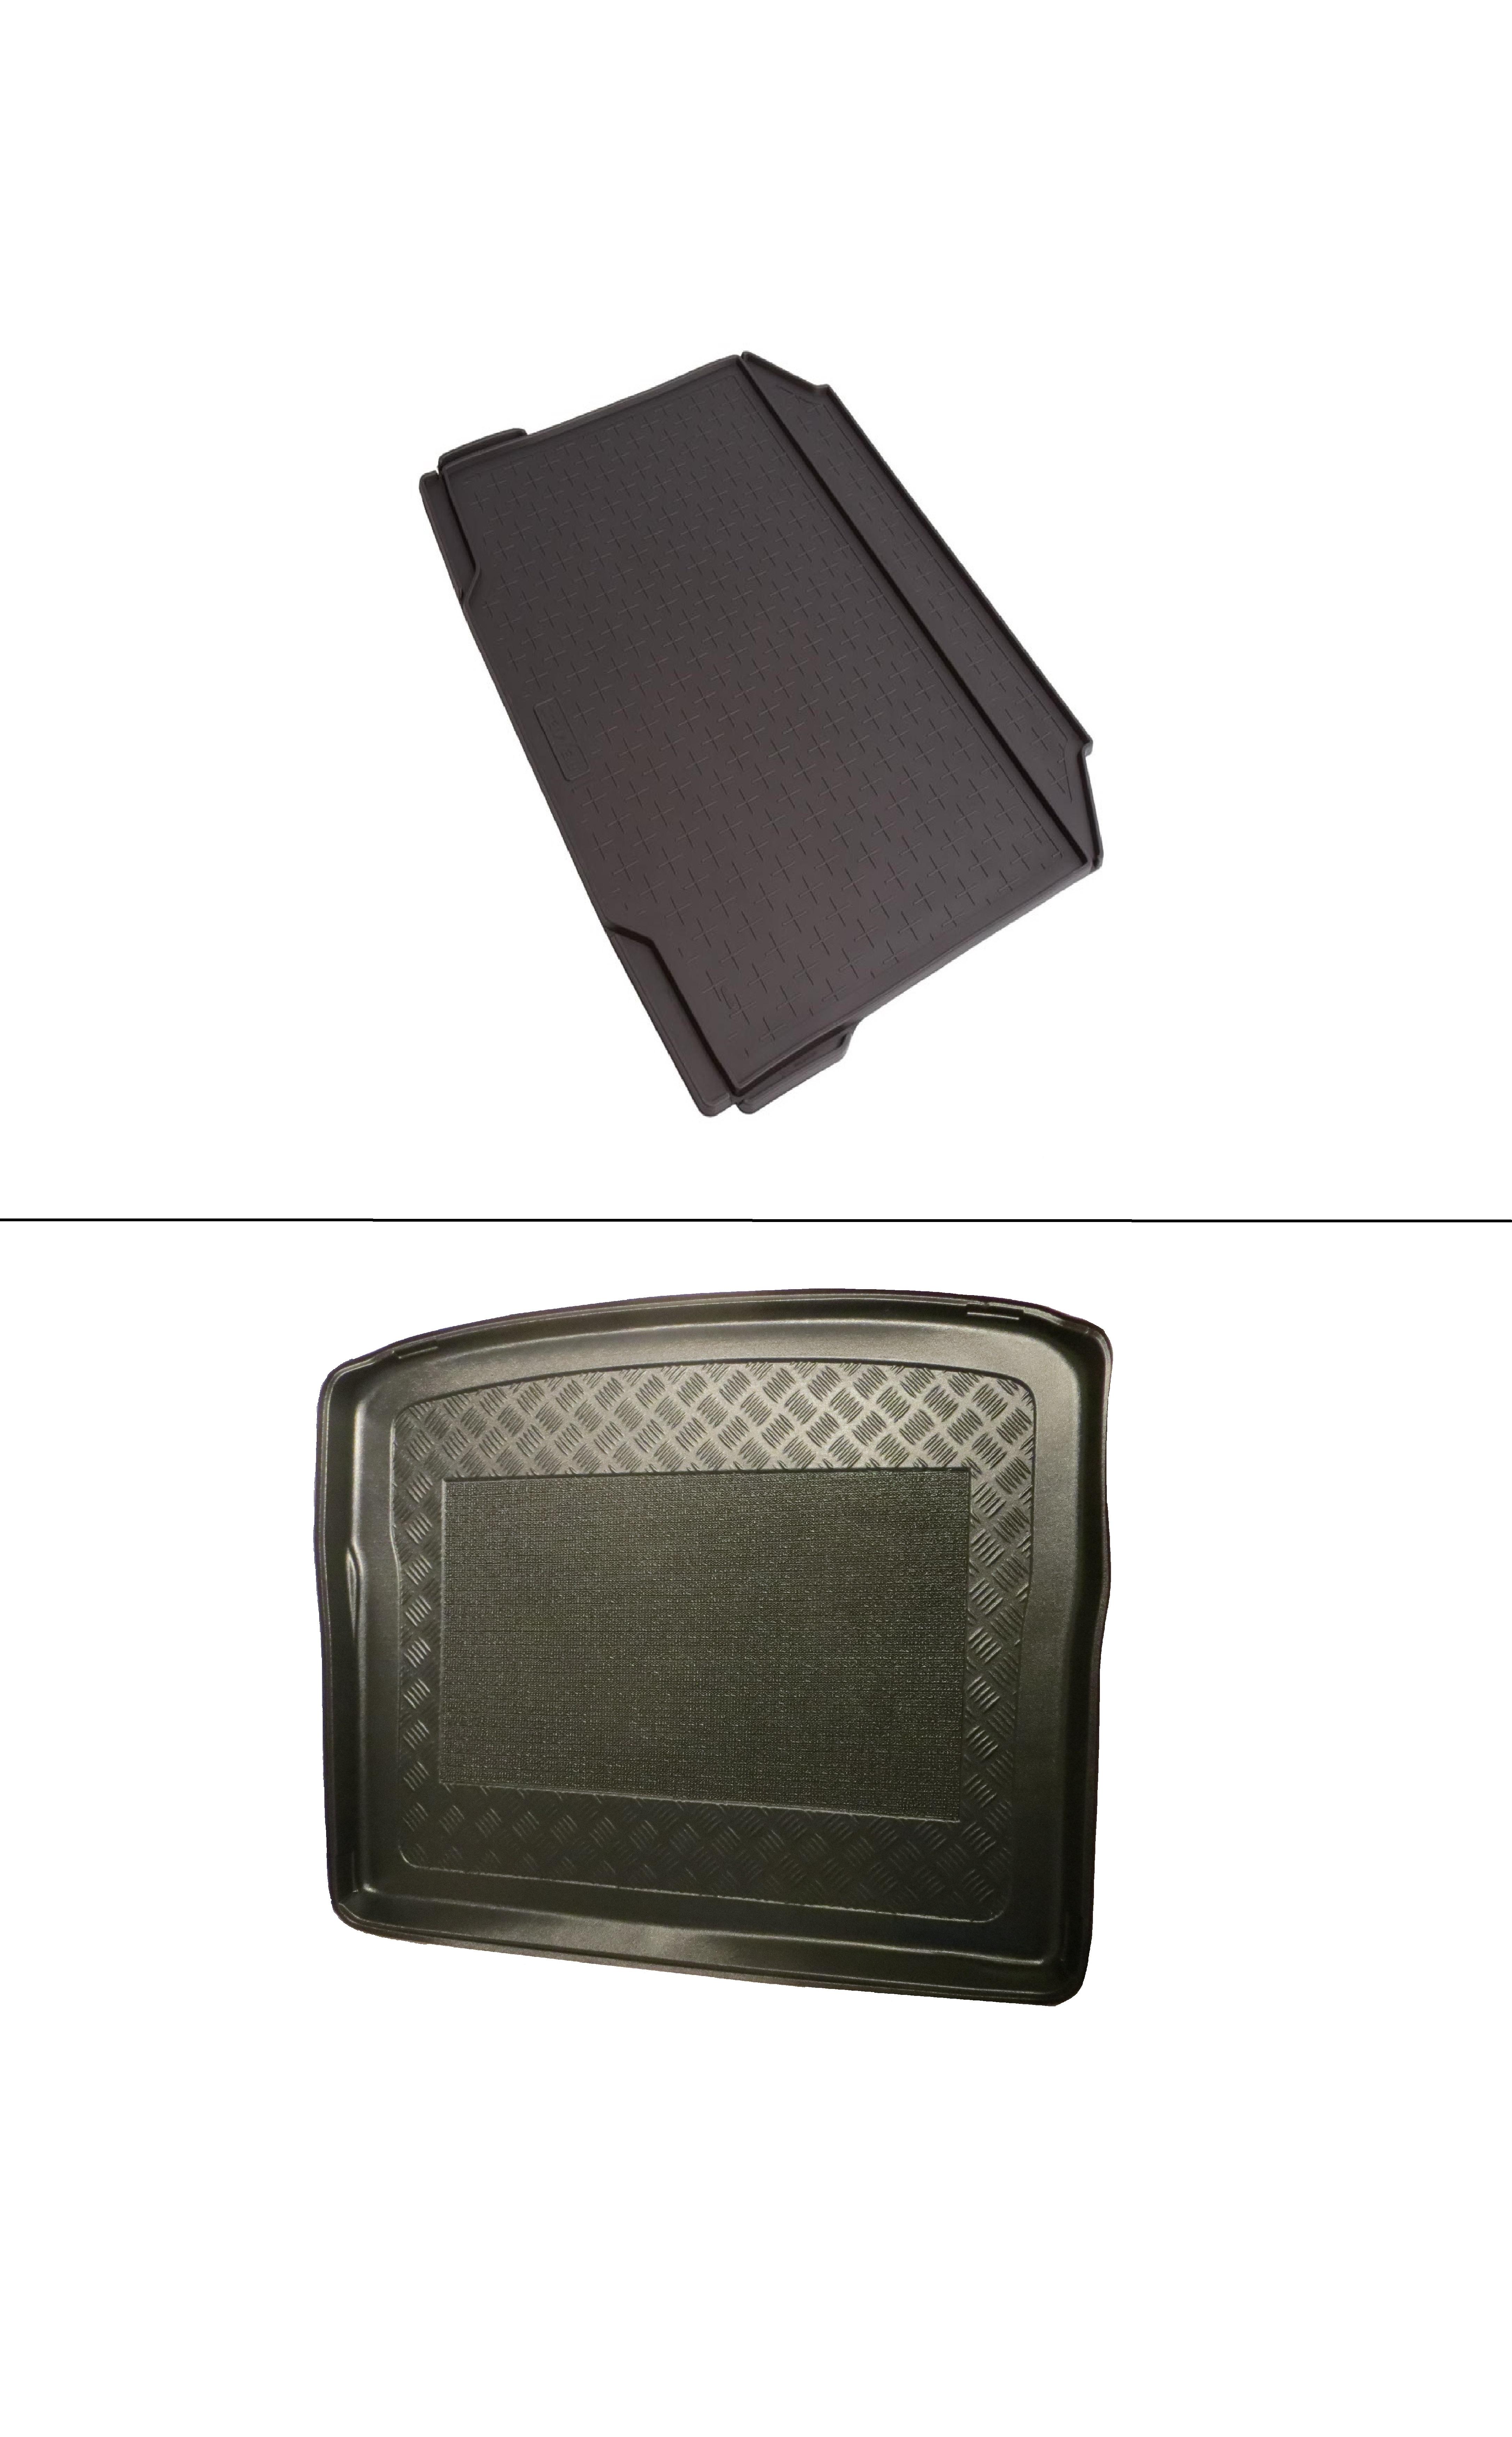 kofferraumwanne kofferraummatte skoda yeti ab 2009. Black Bedroom Furniture Sets. Home Design Ideas